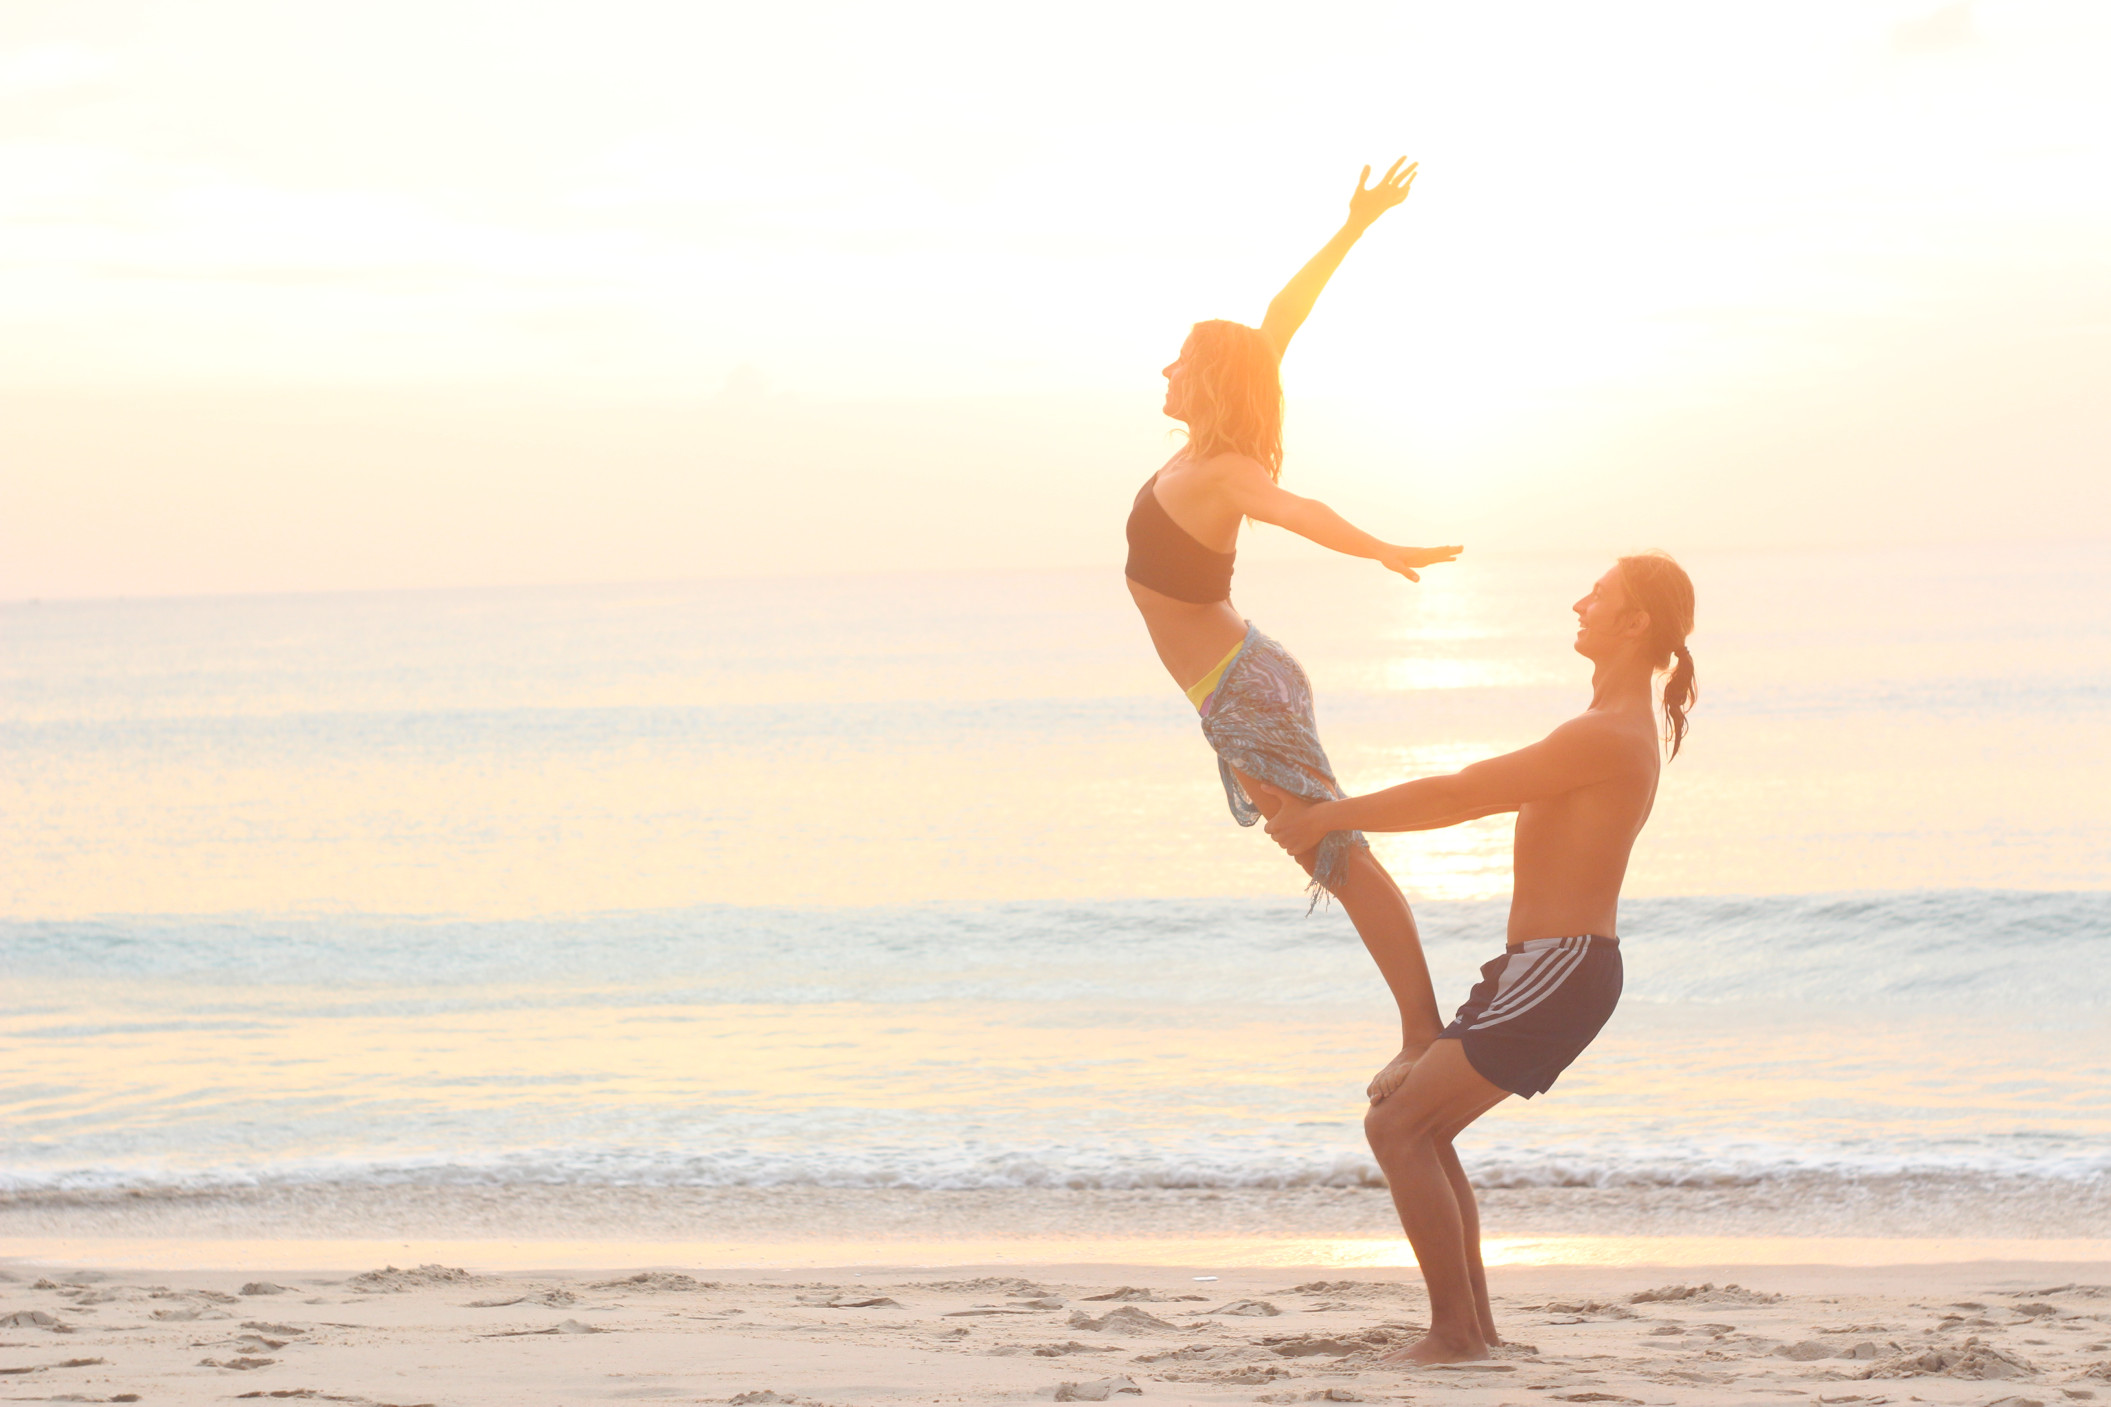 support-love-freedom-flight-trust-happy-couple-sunset-yoga-yoga-on-the-beach-acro-yoga-yoga-couple_t20_g89nzd-2